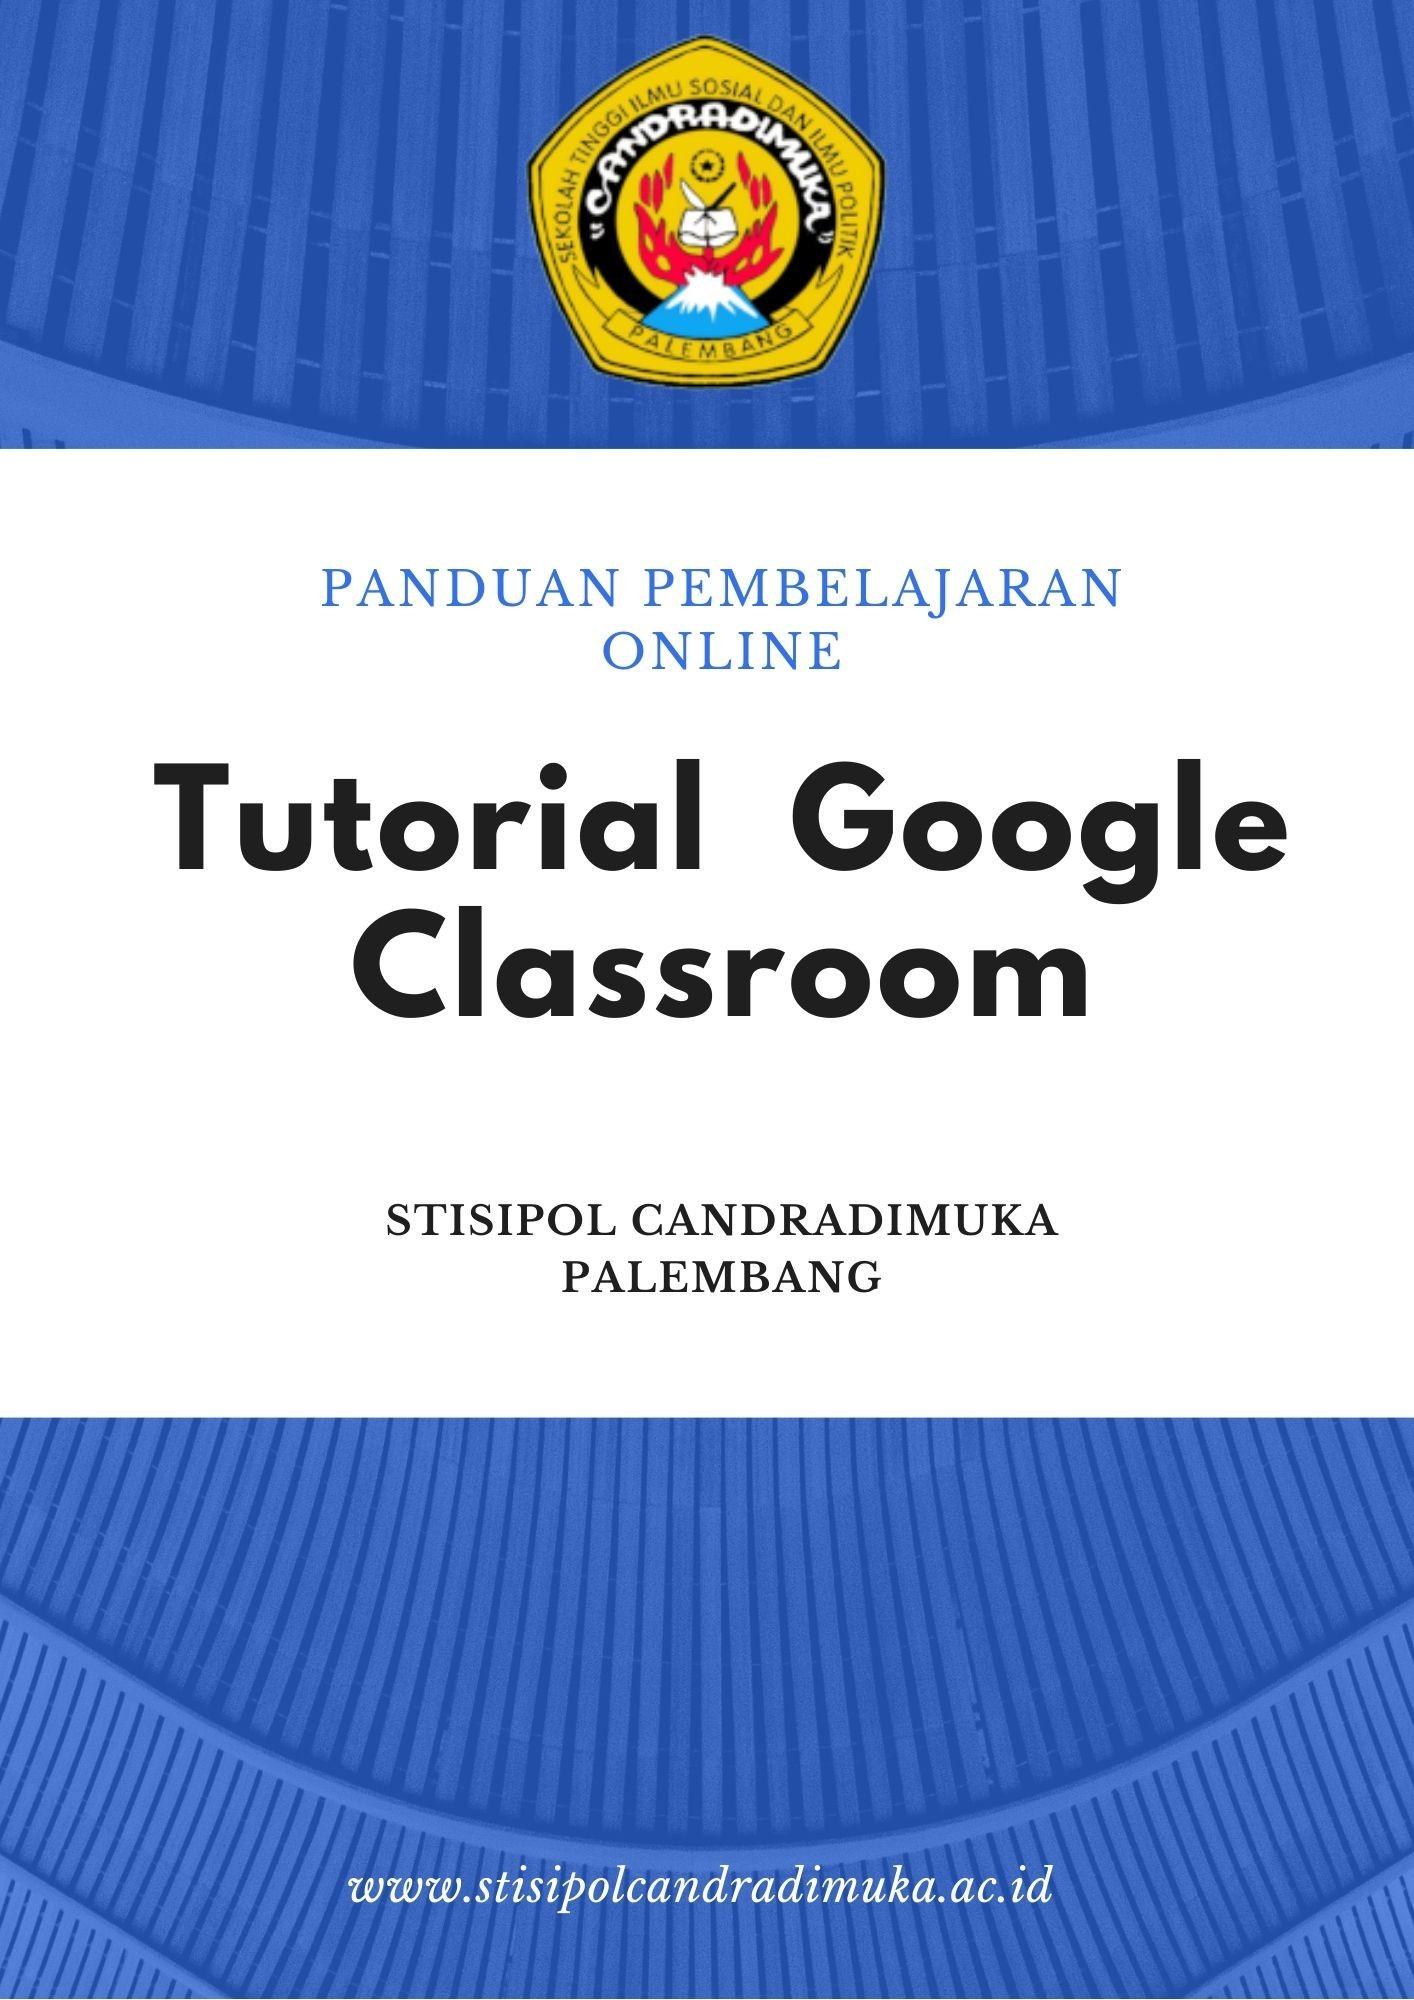 Panduan Join Google Classroom